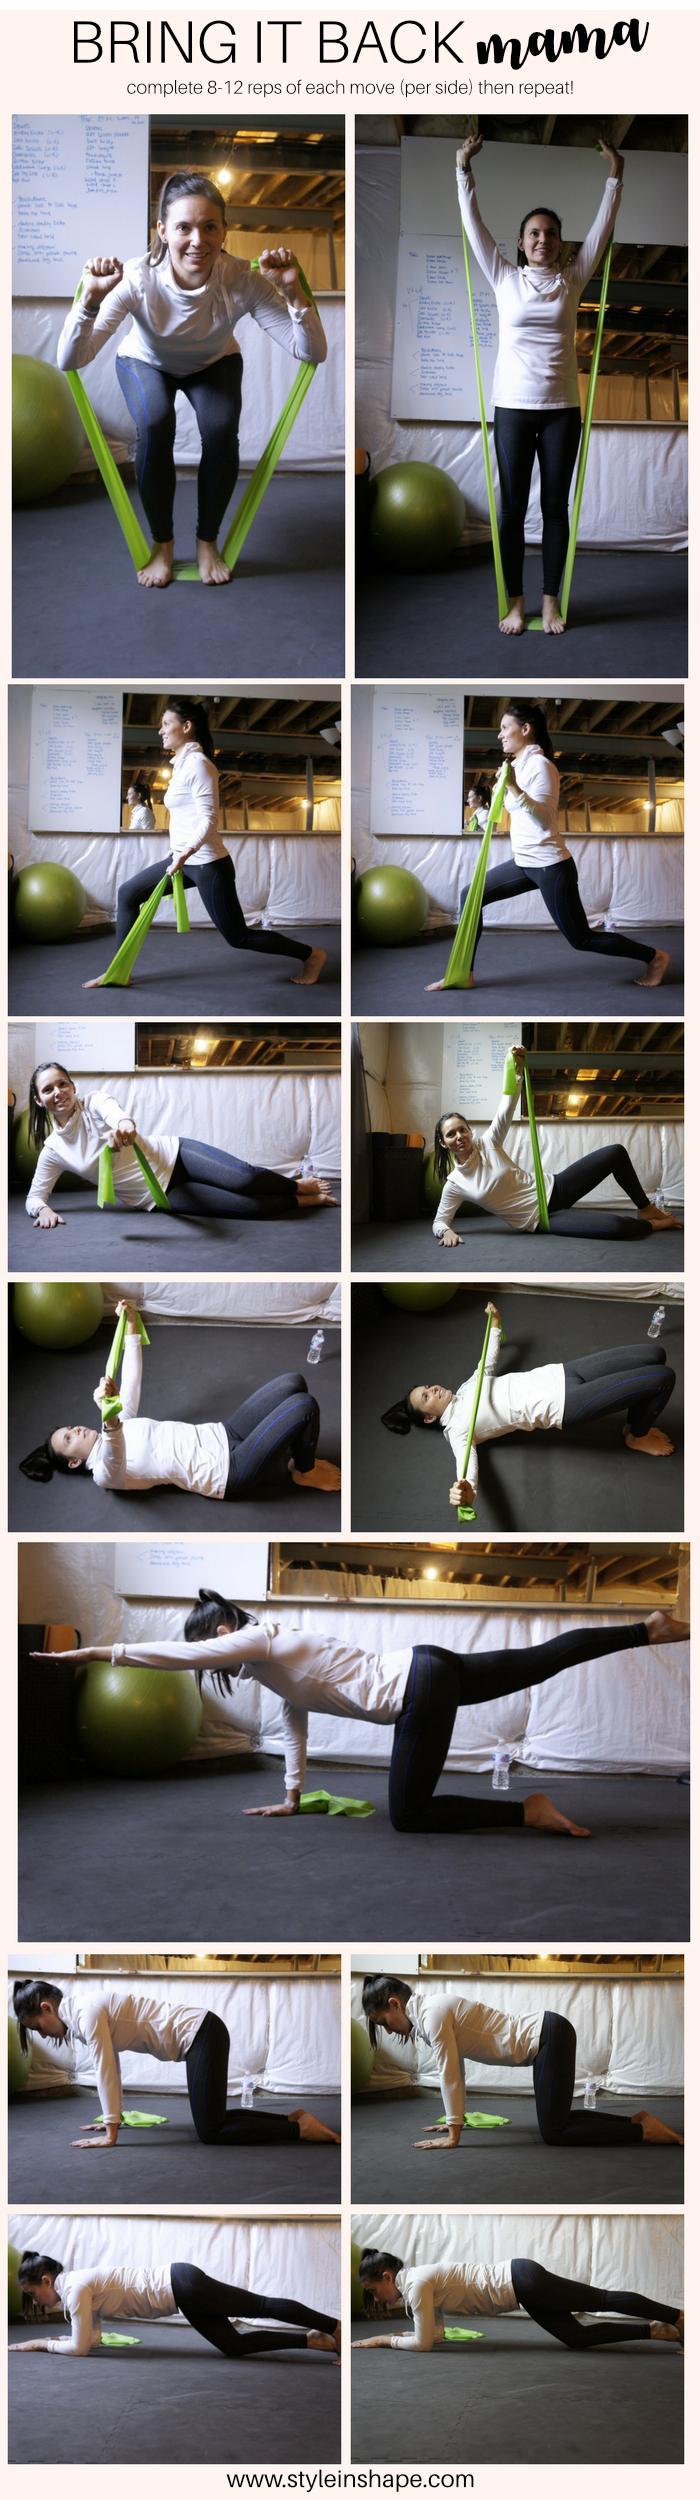 bring-it-back-mama-post-preganancy-workout